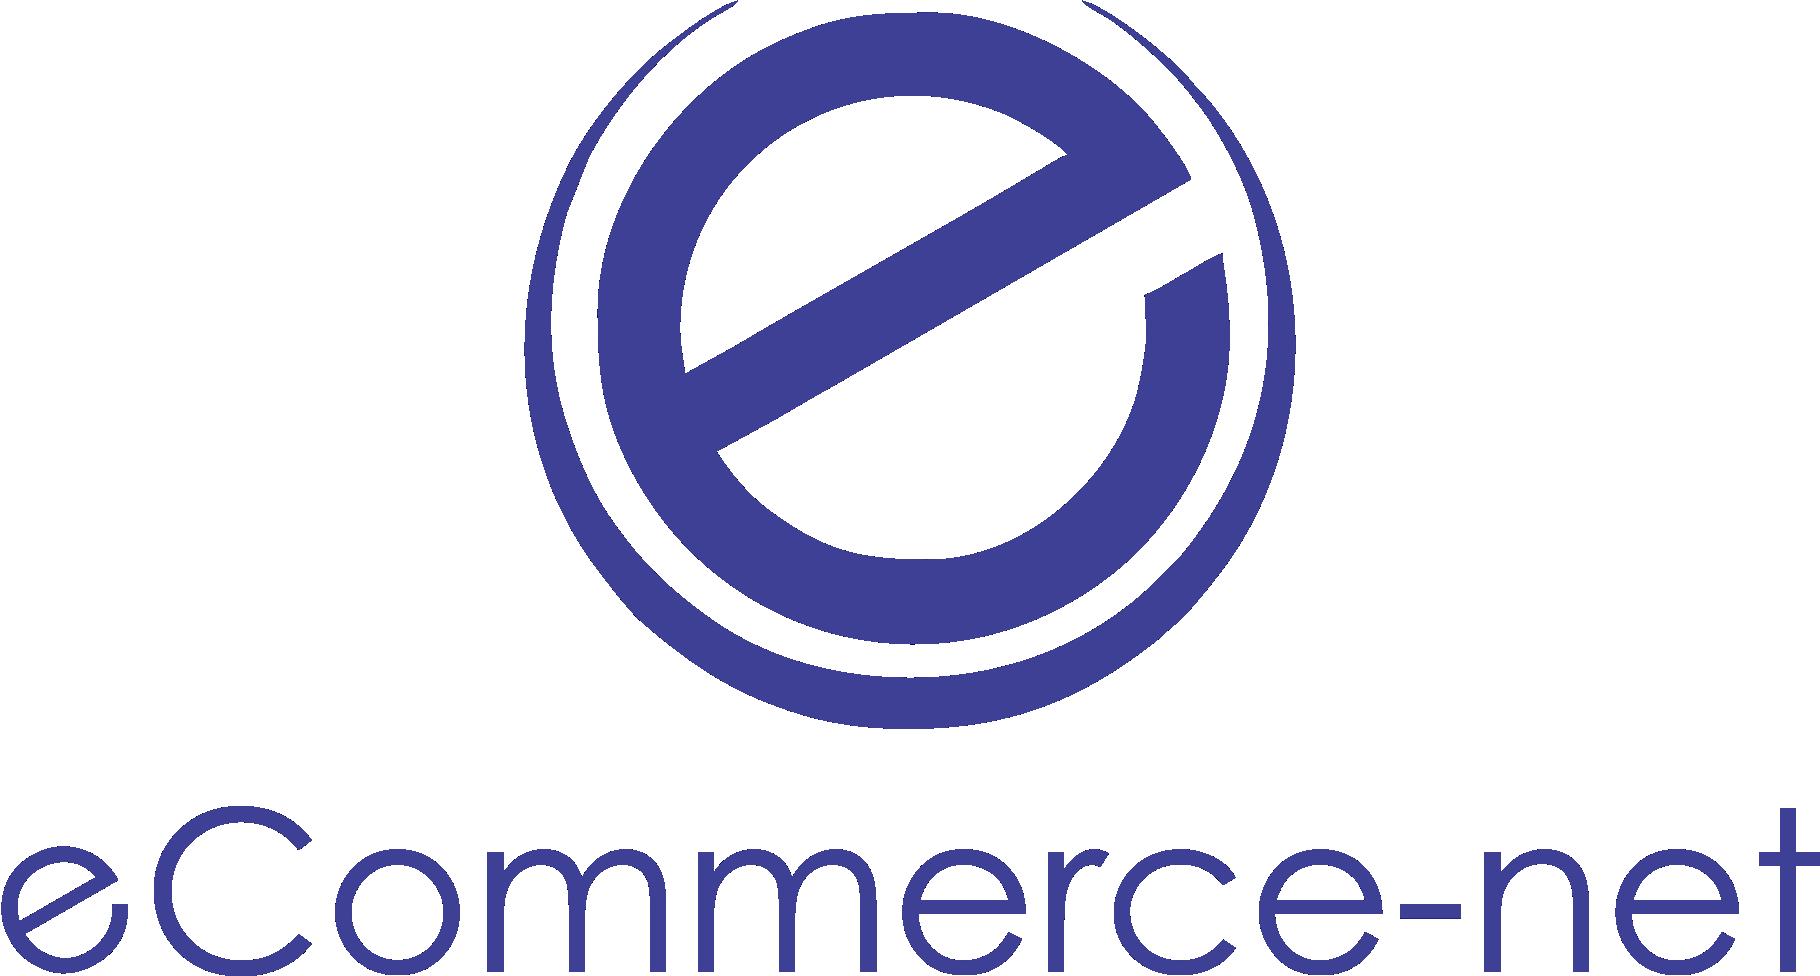 Ecommerce-net